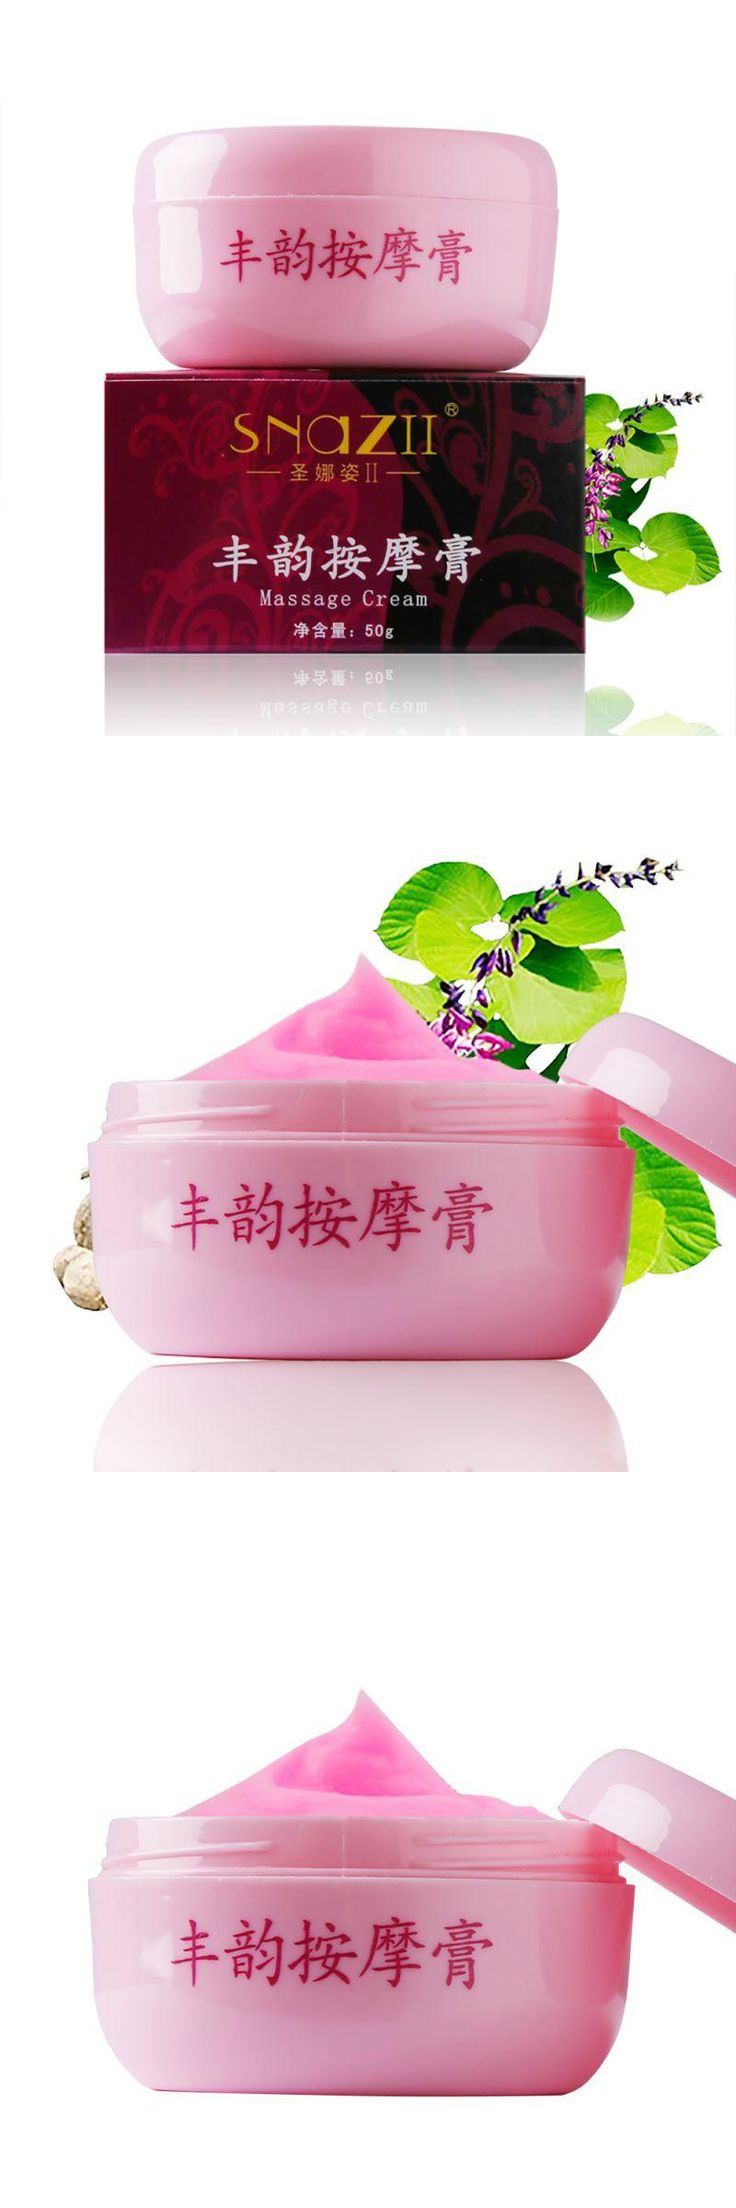 [Visit to Buy] Breast Enlargement Must UP Cream Mirifica Pueraria Bust augmentation Enhancement Women Health Beauty #Advertisement